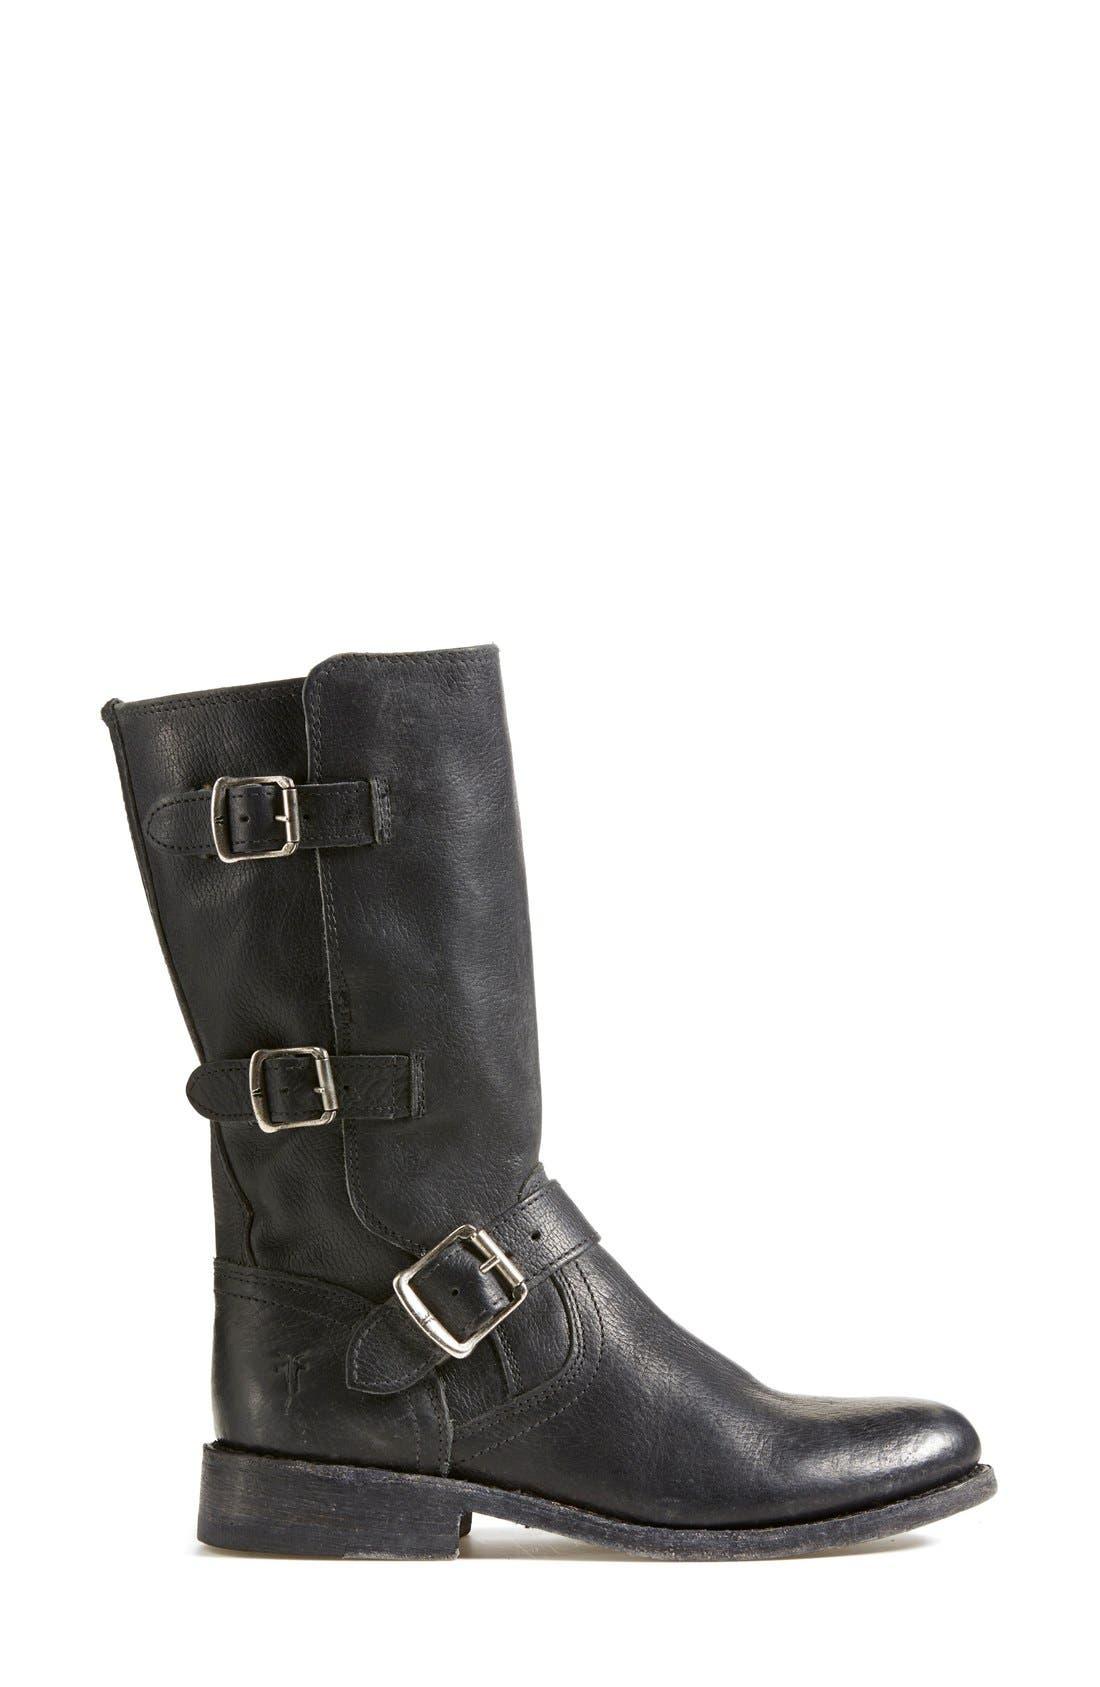 'Jayden' Leather Moto Boot,                             Alternate thumbnail 6, color,                             001